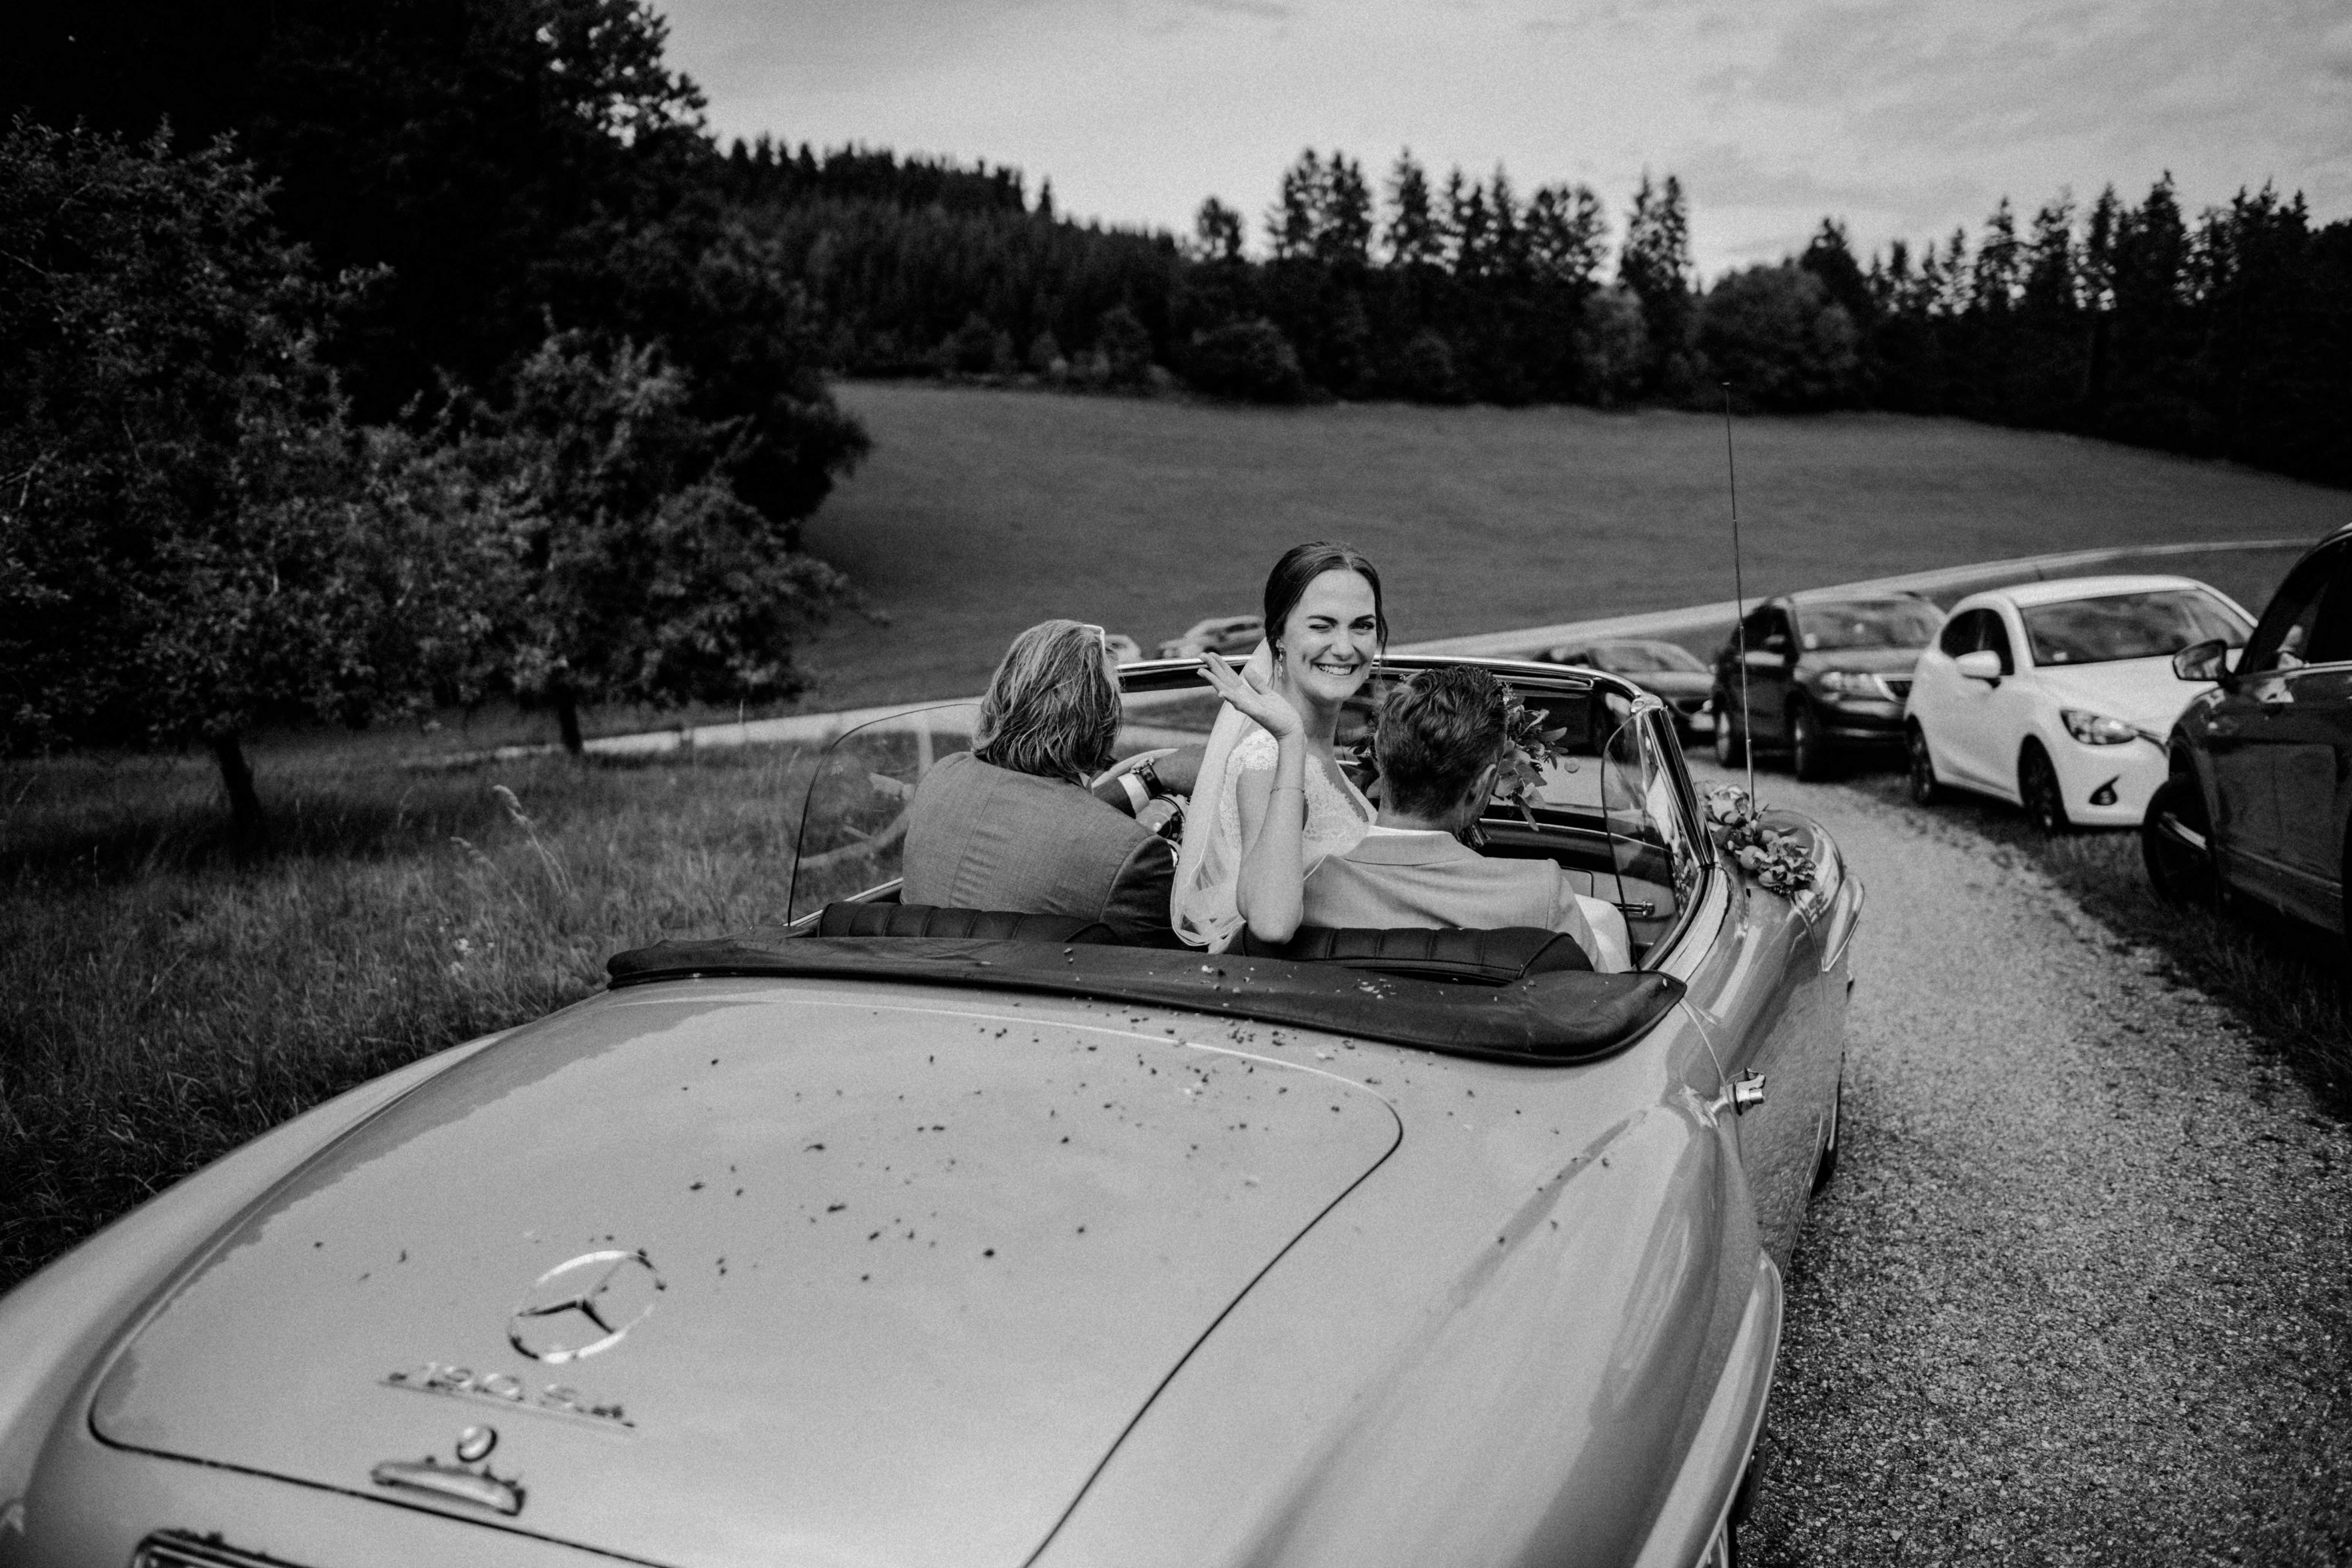 cabriolet mercedesstern sonja poehlmann photography couples muenchen bayern